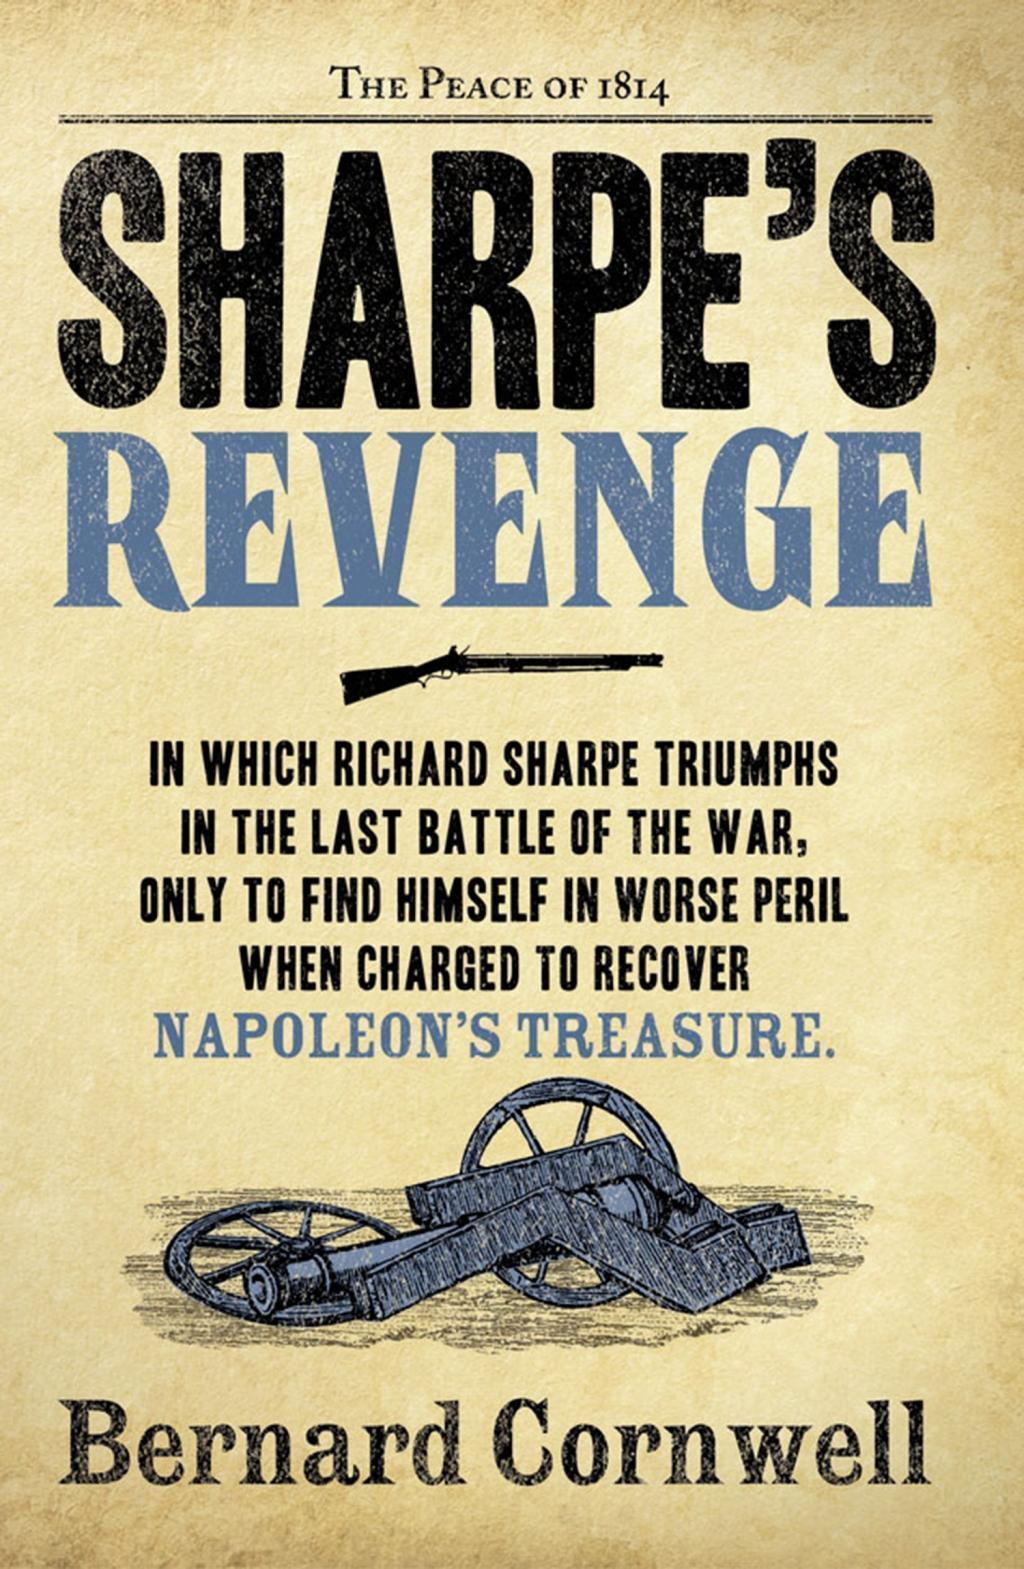 Sharpe's Revenge: The Peace of 1814 (The Sharpe Series, Book 19)